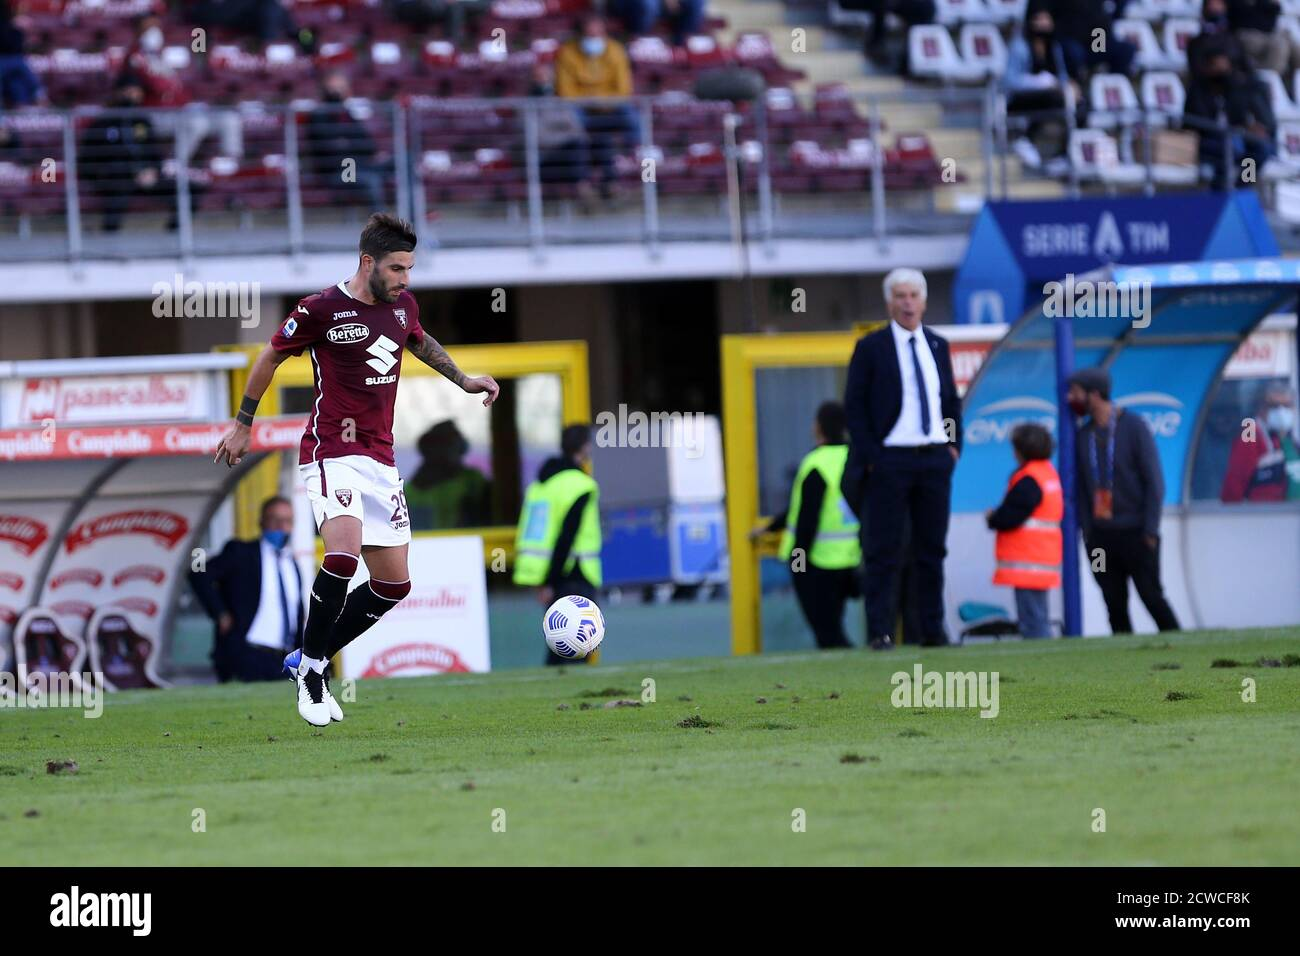 Torino, Italy. 26th September 2020. Nicola Murru of Torino FC   during the the Serie A match  between Torino Fc and Atalanta Calcio. Stock Photo